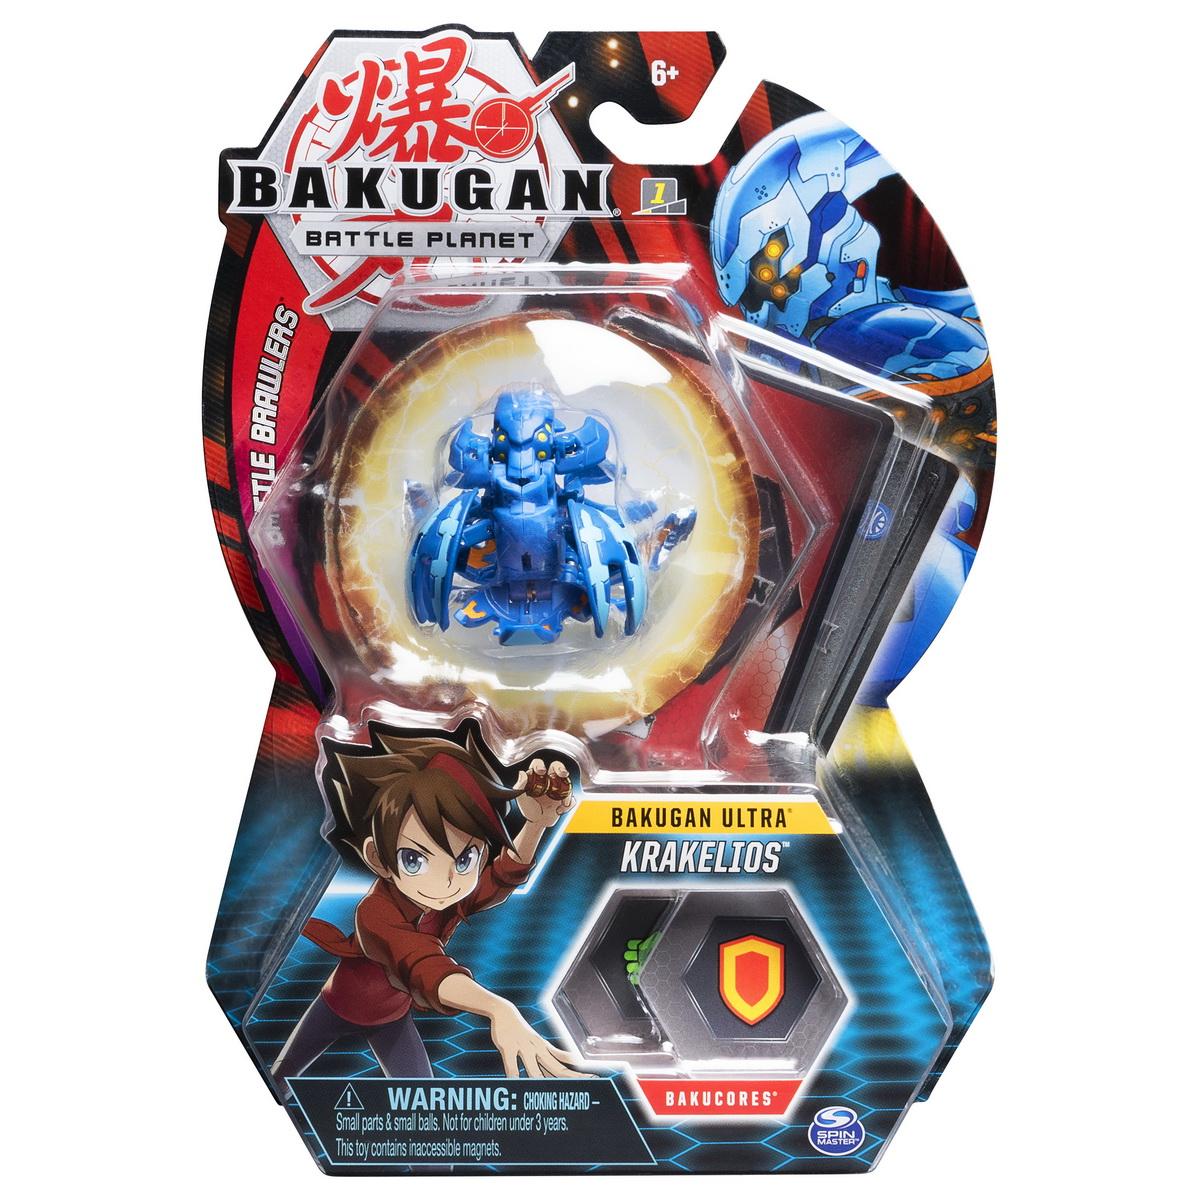 Bakugan Ultra Bila Krakelios